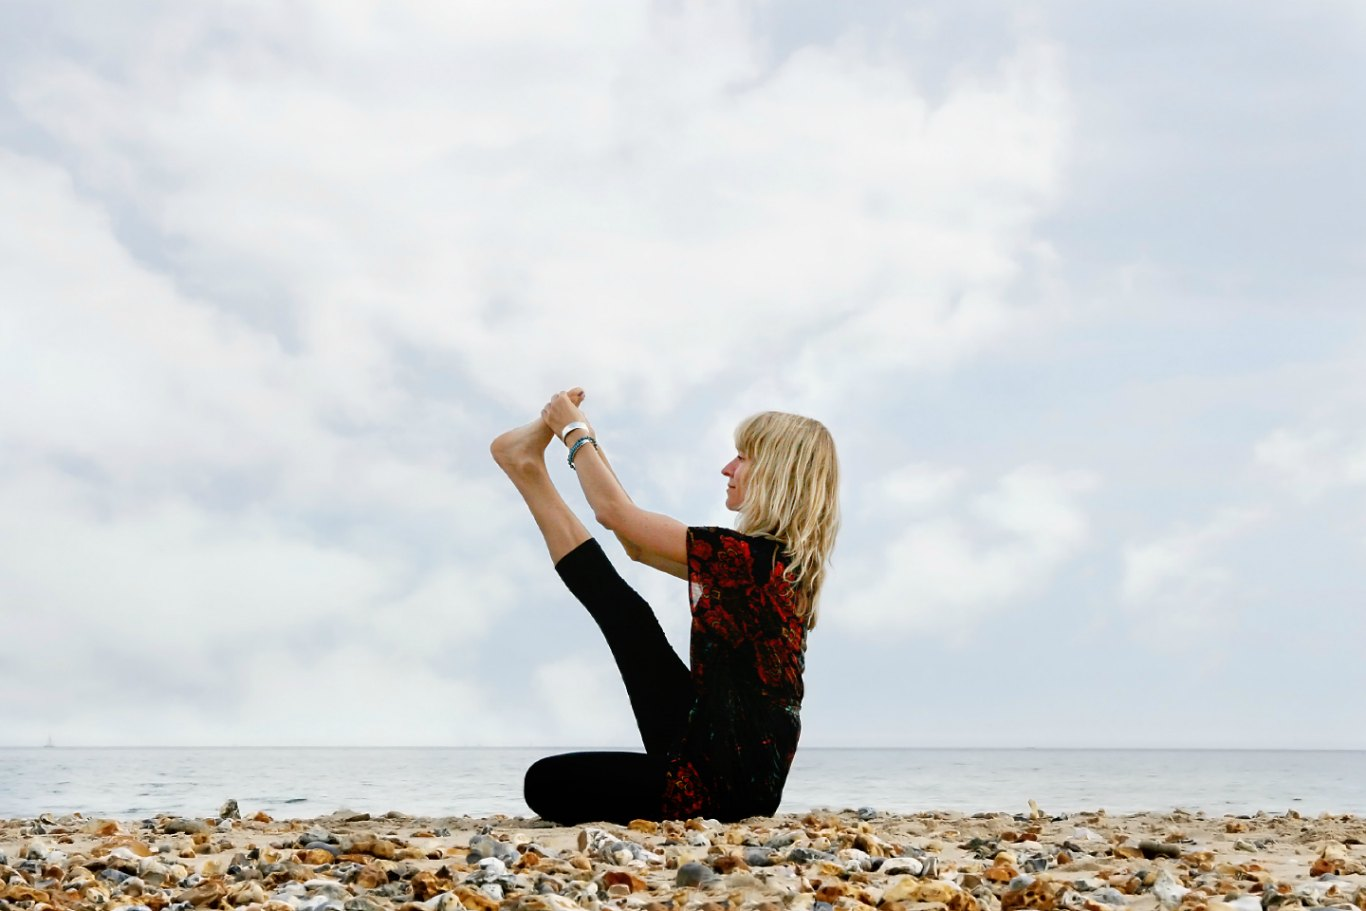 Yogamind.co.uk Pati beach picture 1